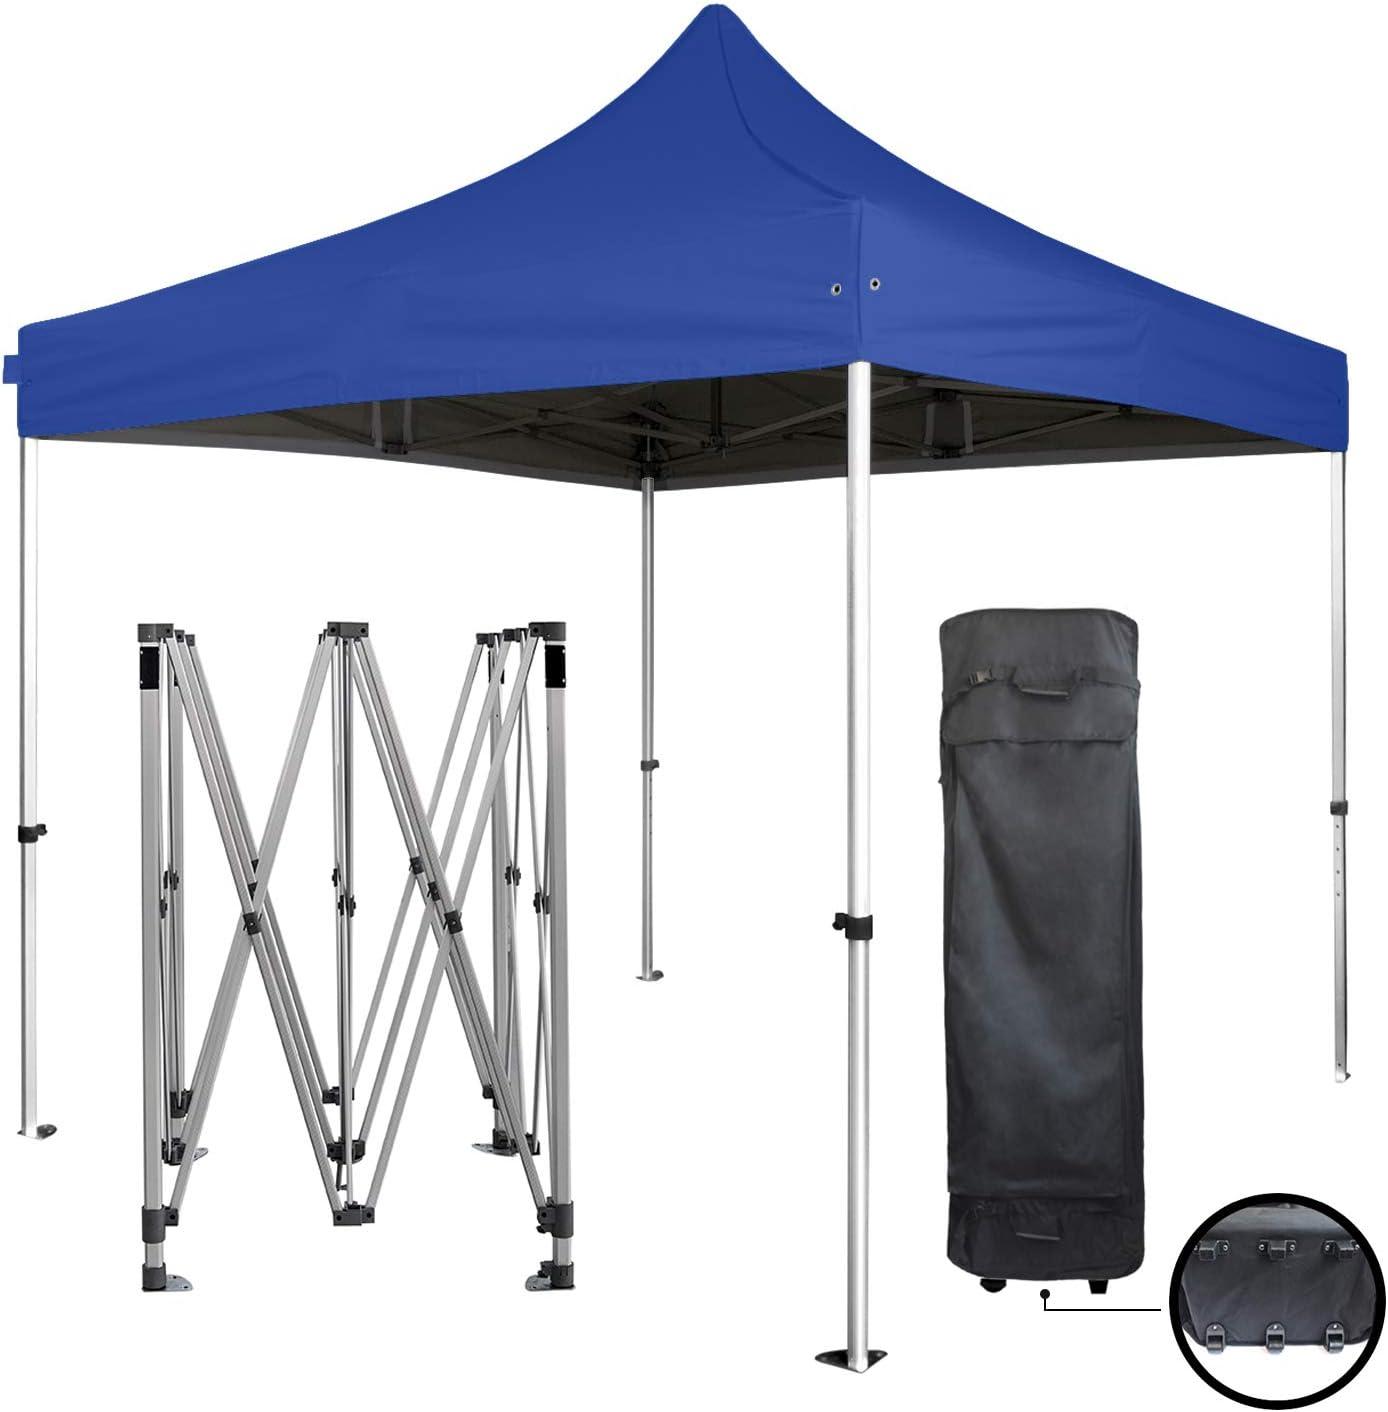 GREADEN - Tienda de campaña plegable 3 x 3 m Super - Tubo 40 mm en aluminio - lona 300 G/m2 - azul marino - Barnum plegable - GR-1FB33300PP8: Amazon.es: Jardín